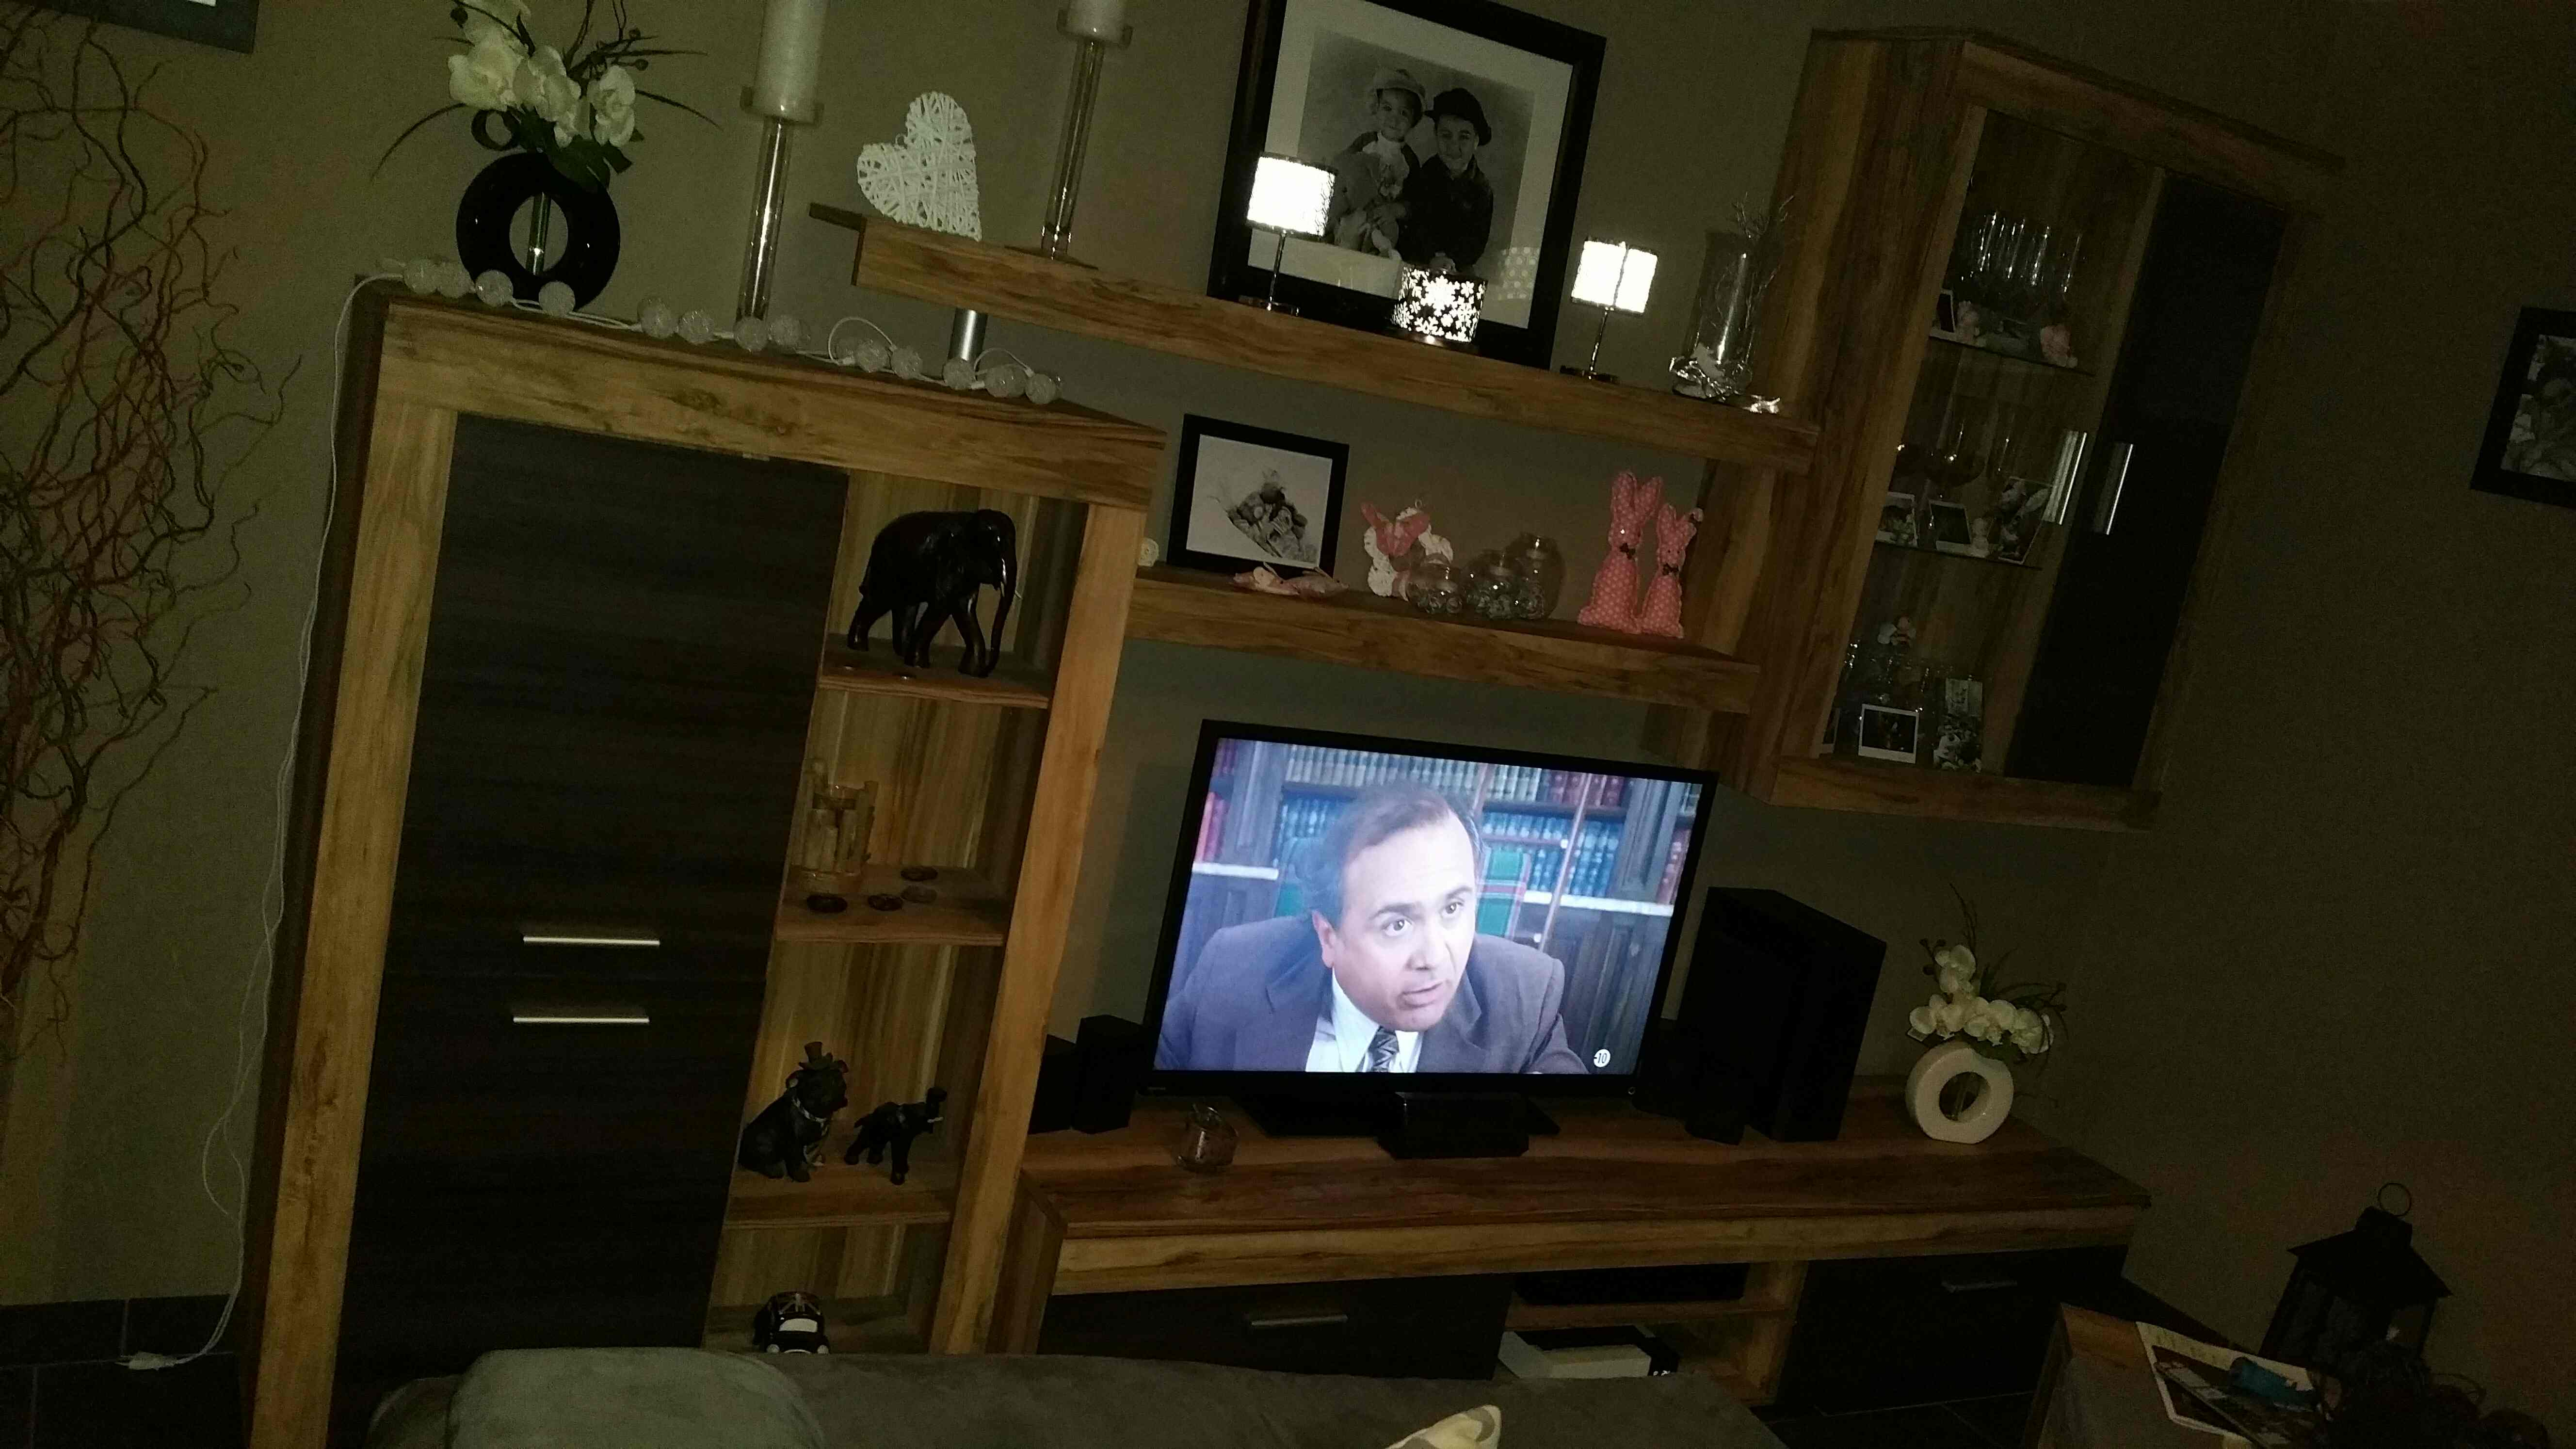 Achetez Meuble Tv Chambre Occasion Annonce Vente Cattenom 57  # Meuble Tv Chambre A Coucher